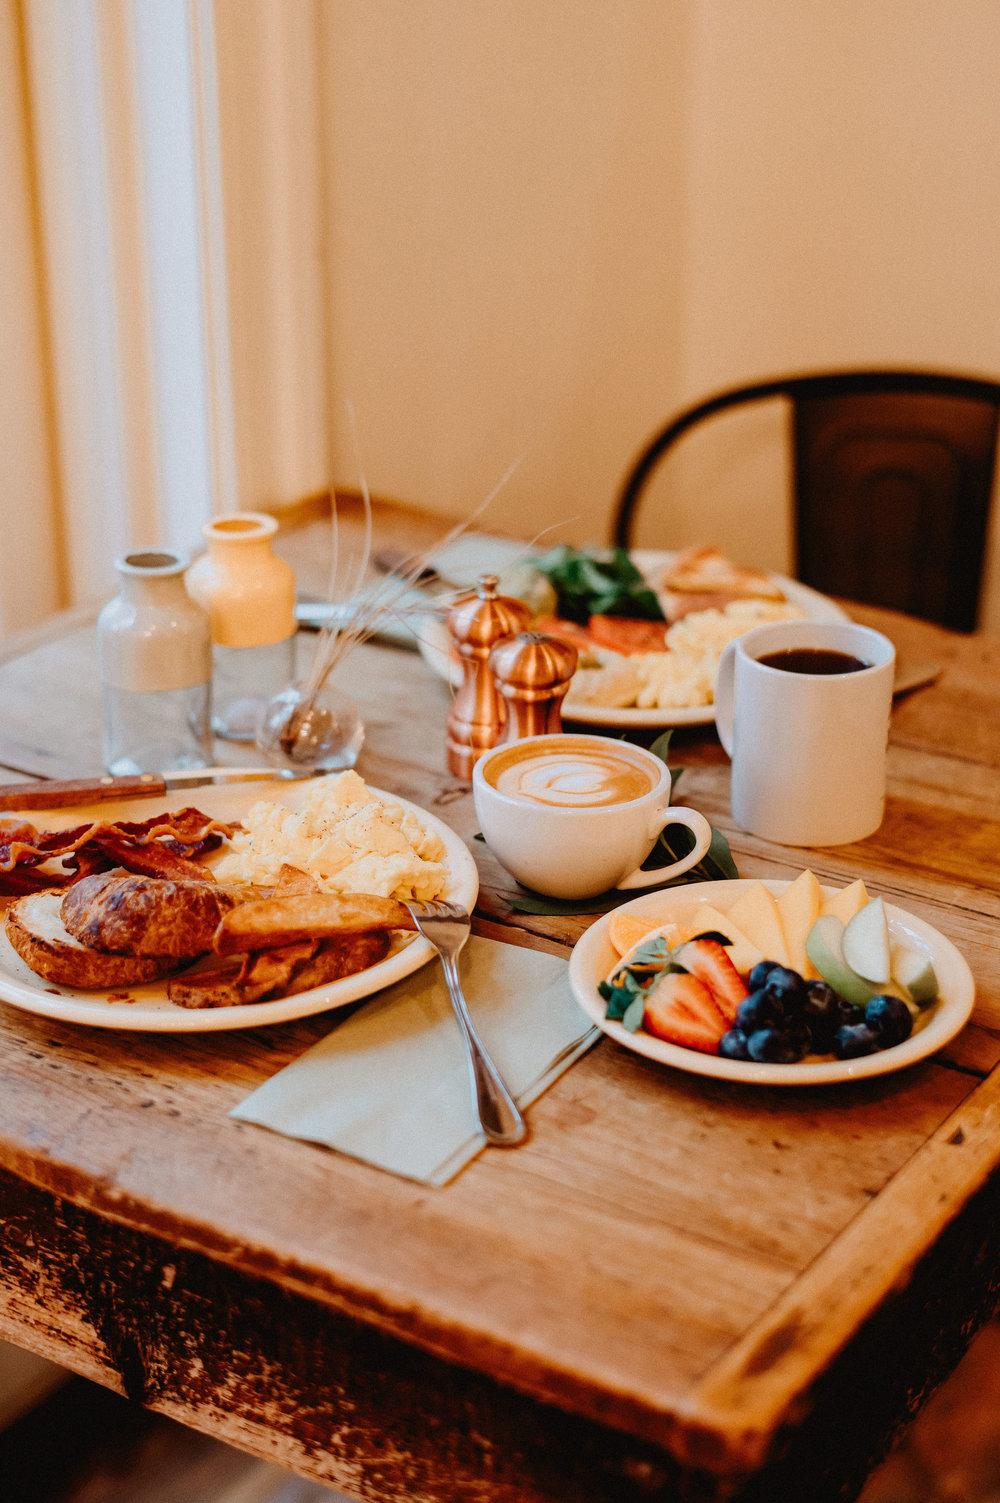 breakfasttable2.jpg